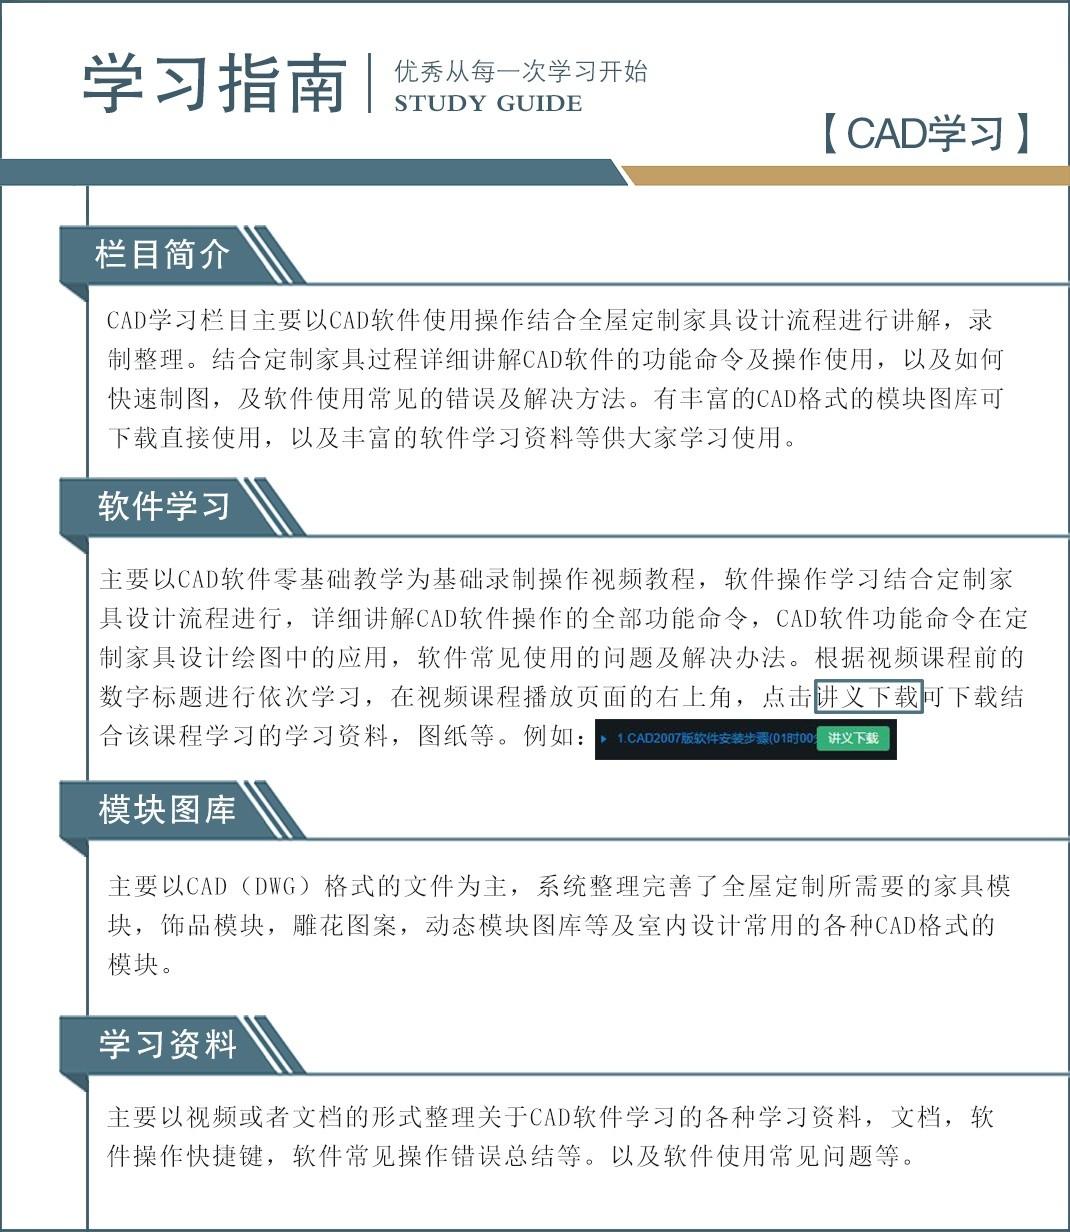 CAD学习指南_看图王.jpg